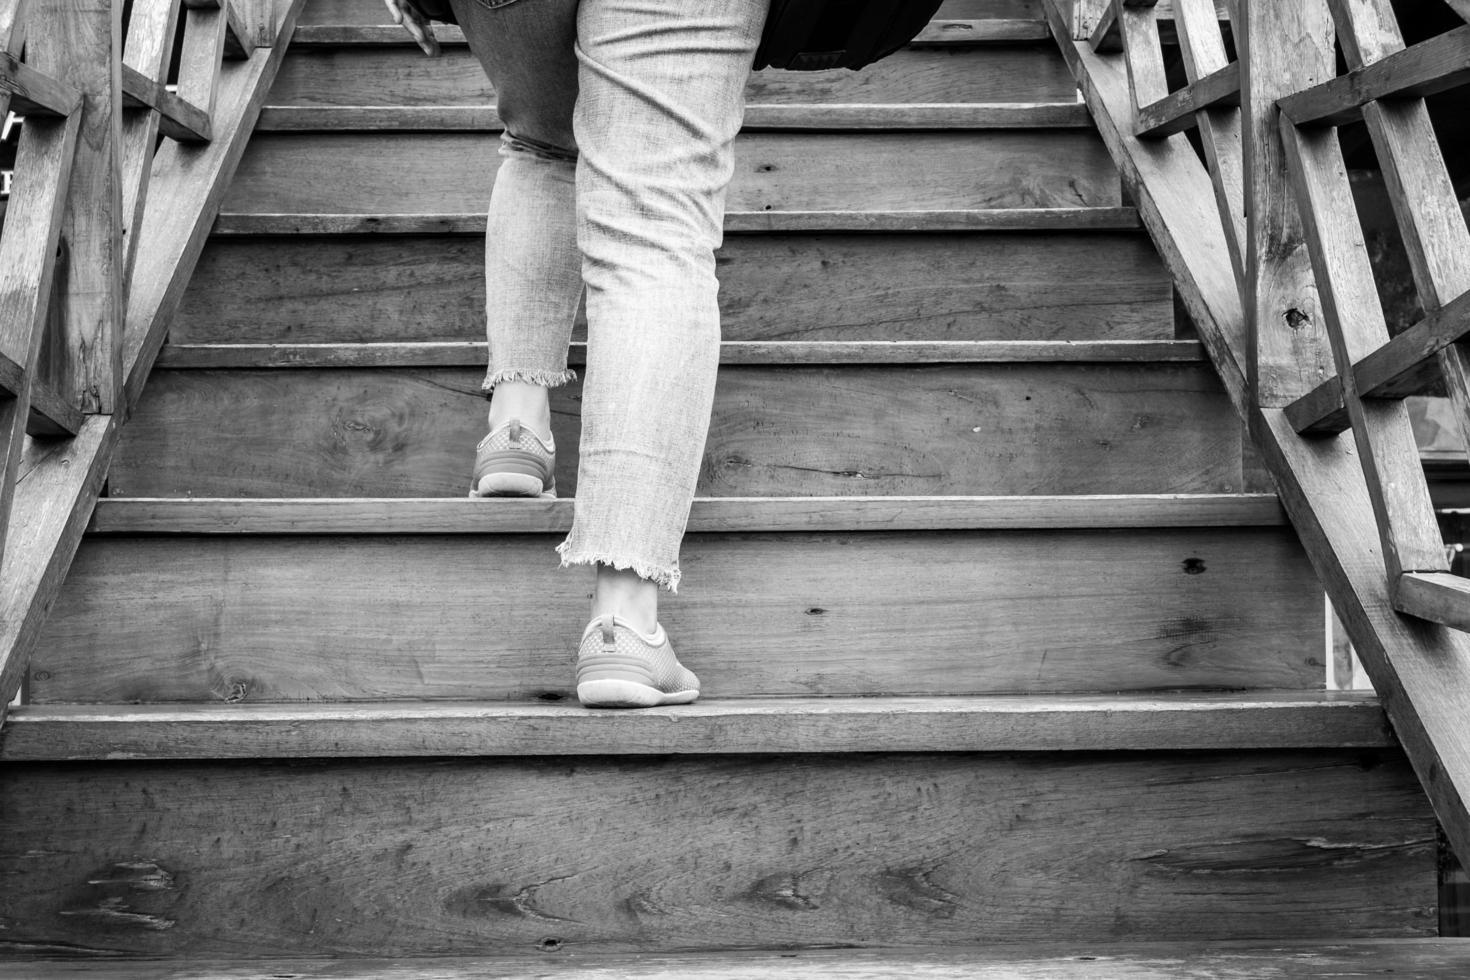 vrouw lopen de trap op foto